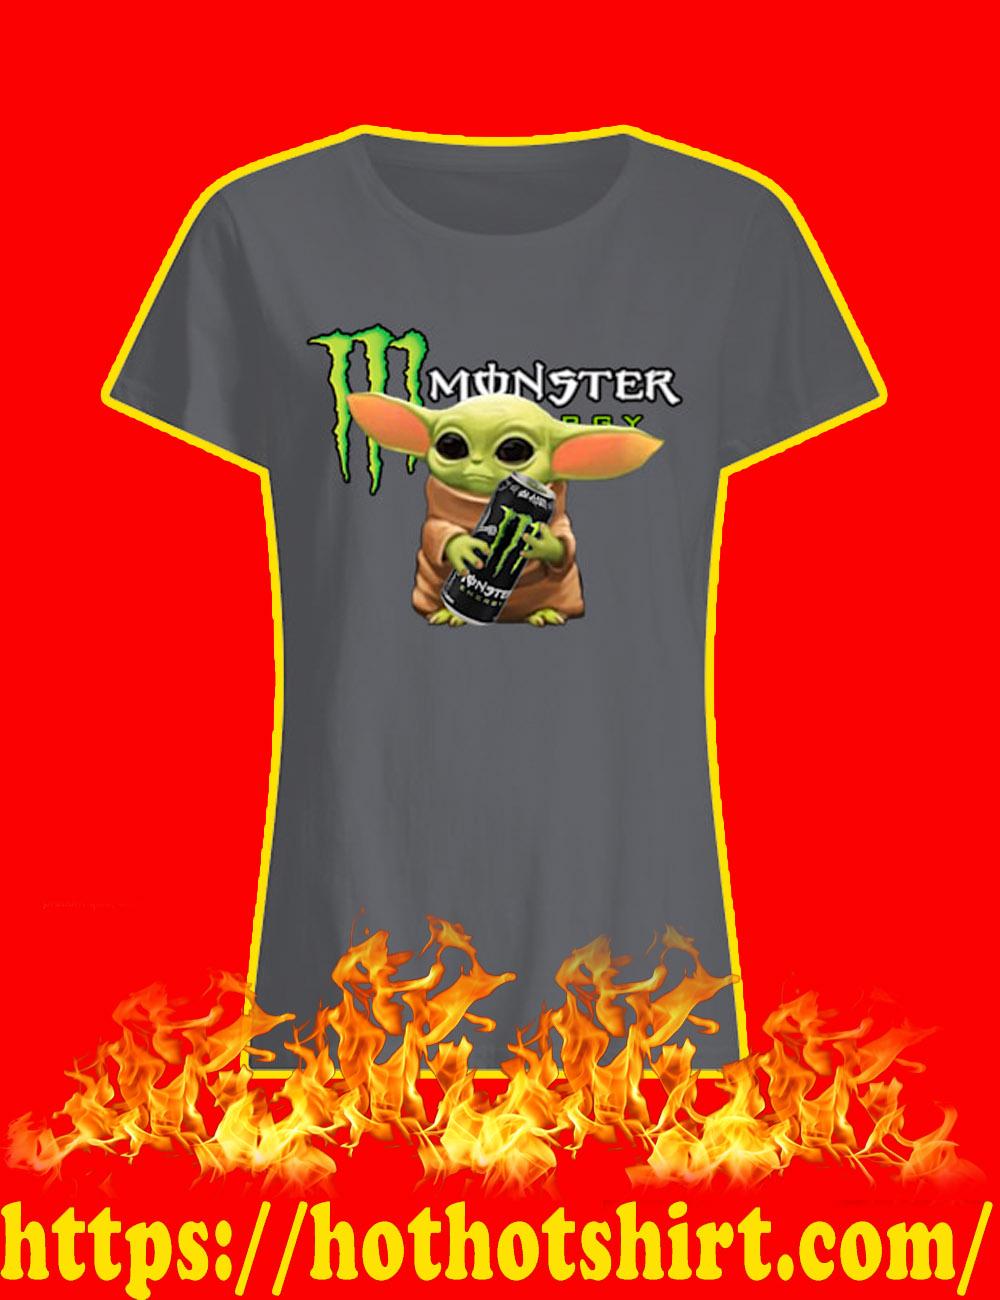 Baby Yoda Monster Energy lady shirt